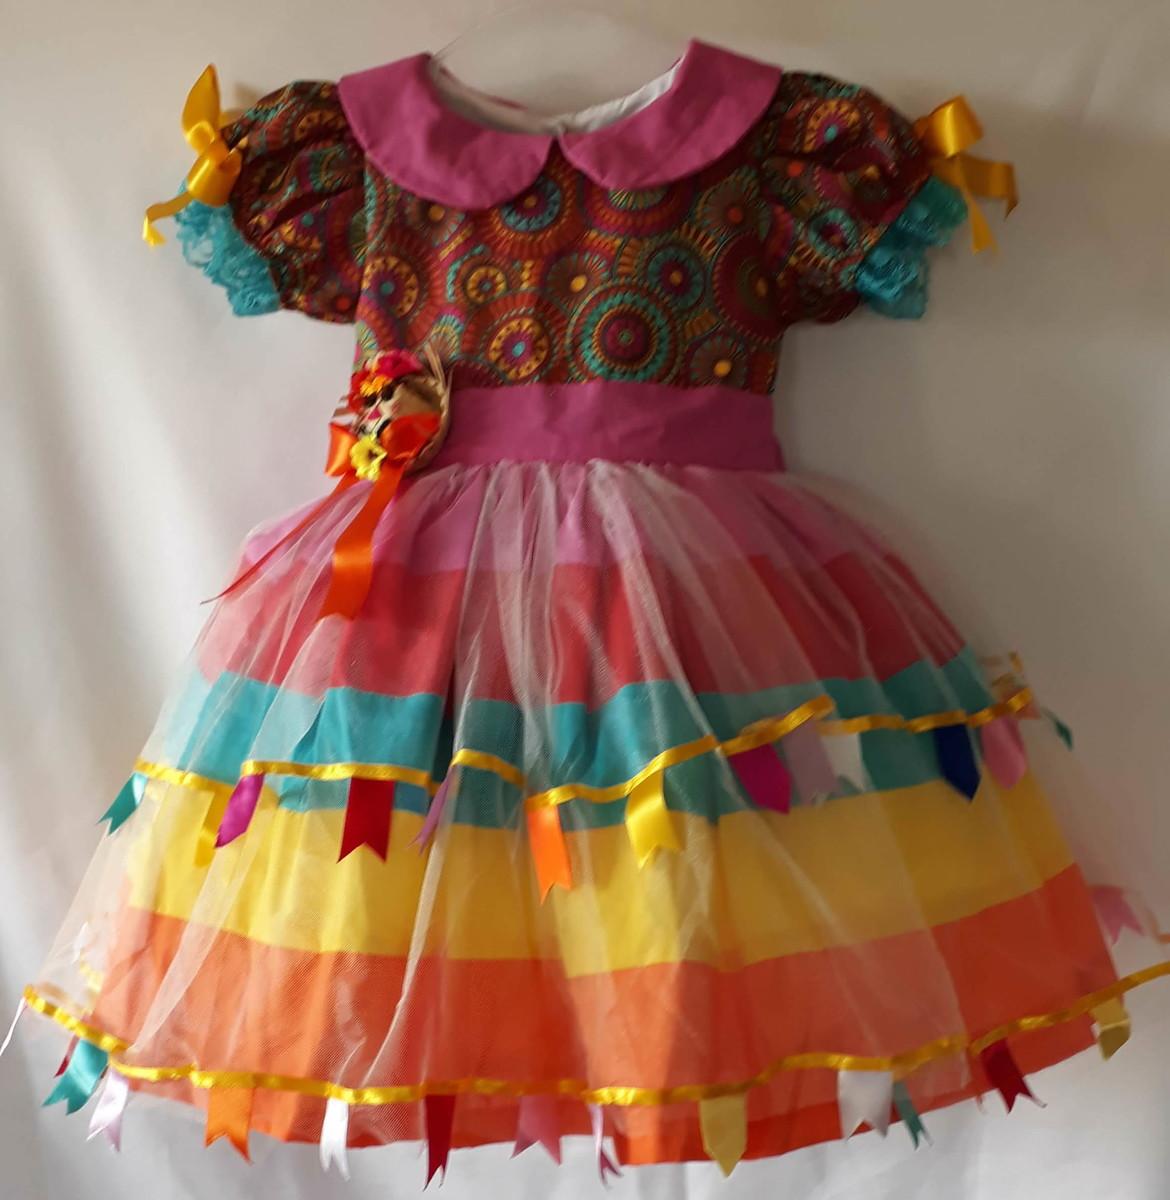 Vestido Infantil De Festa Junina Fashion Colorido